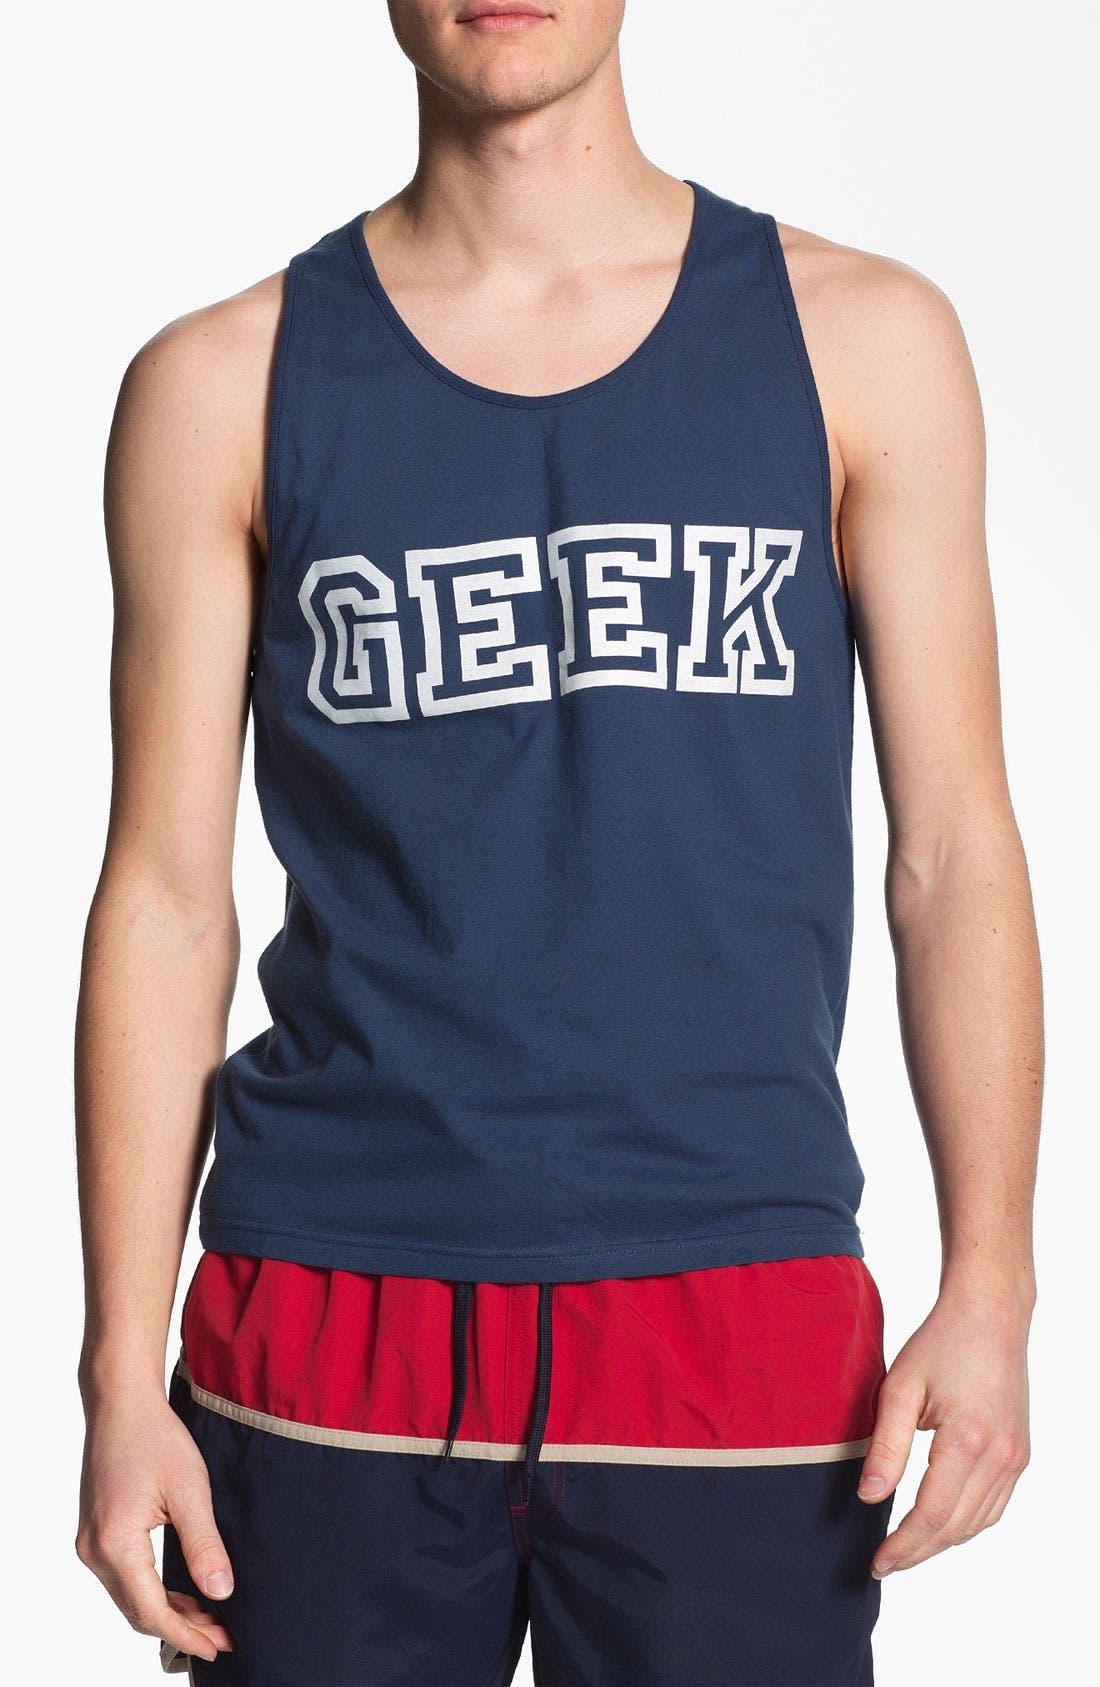 Main Image - Topman 'Geek' Print Tank Top